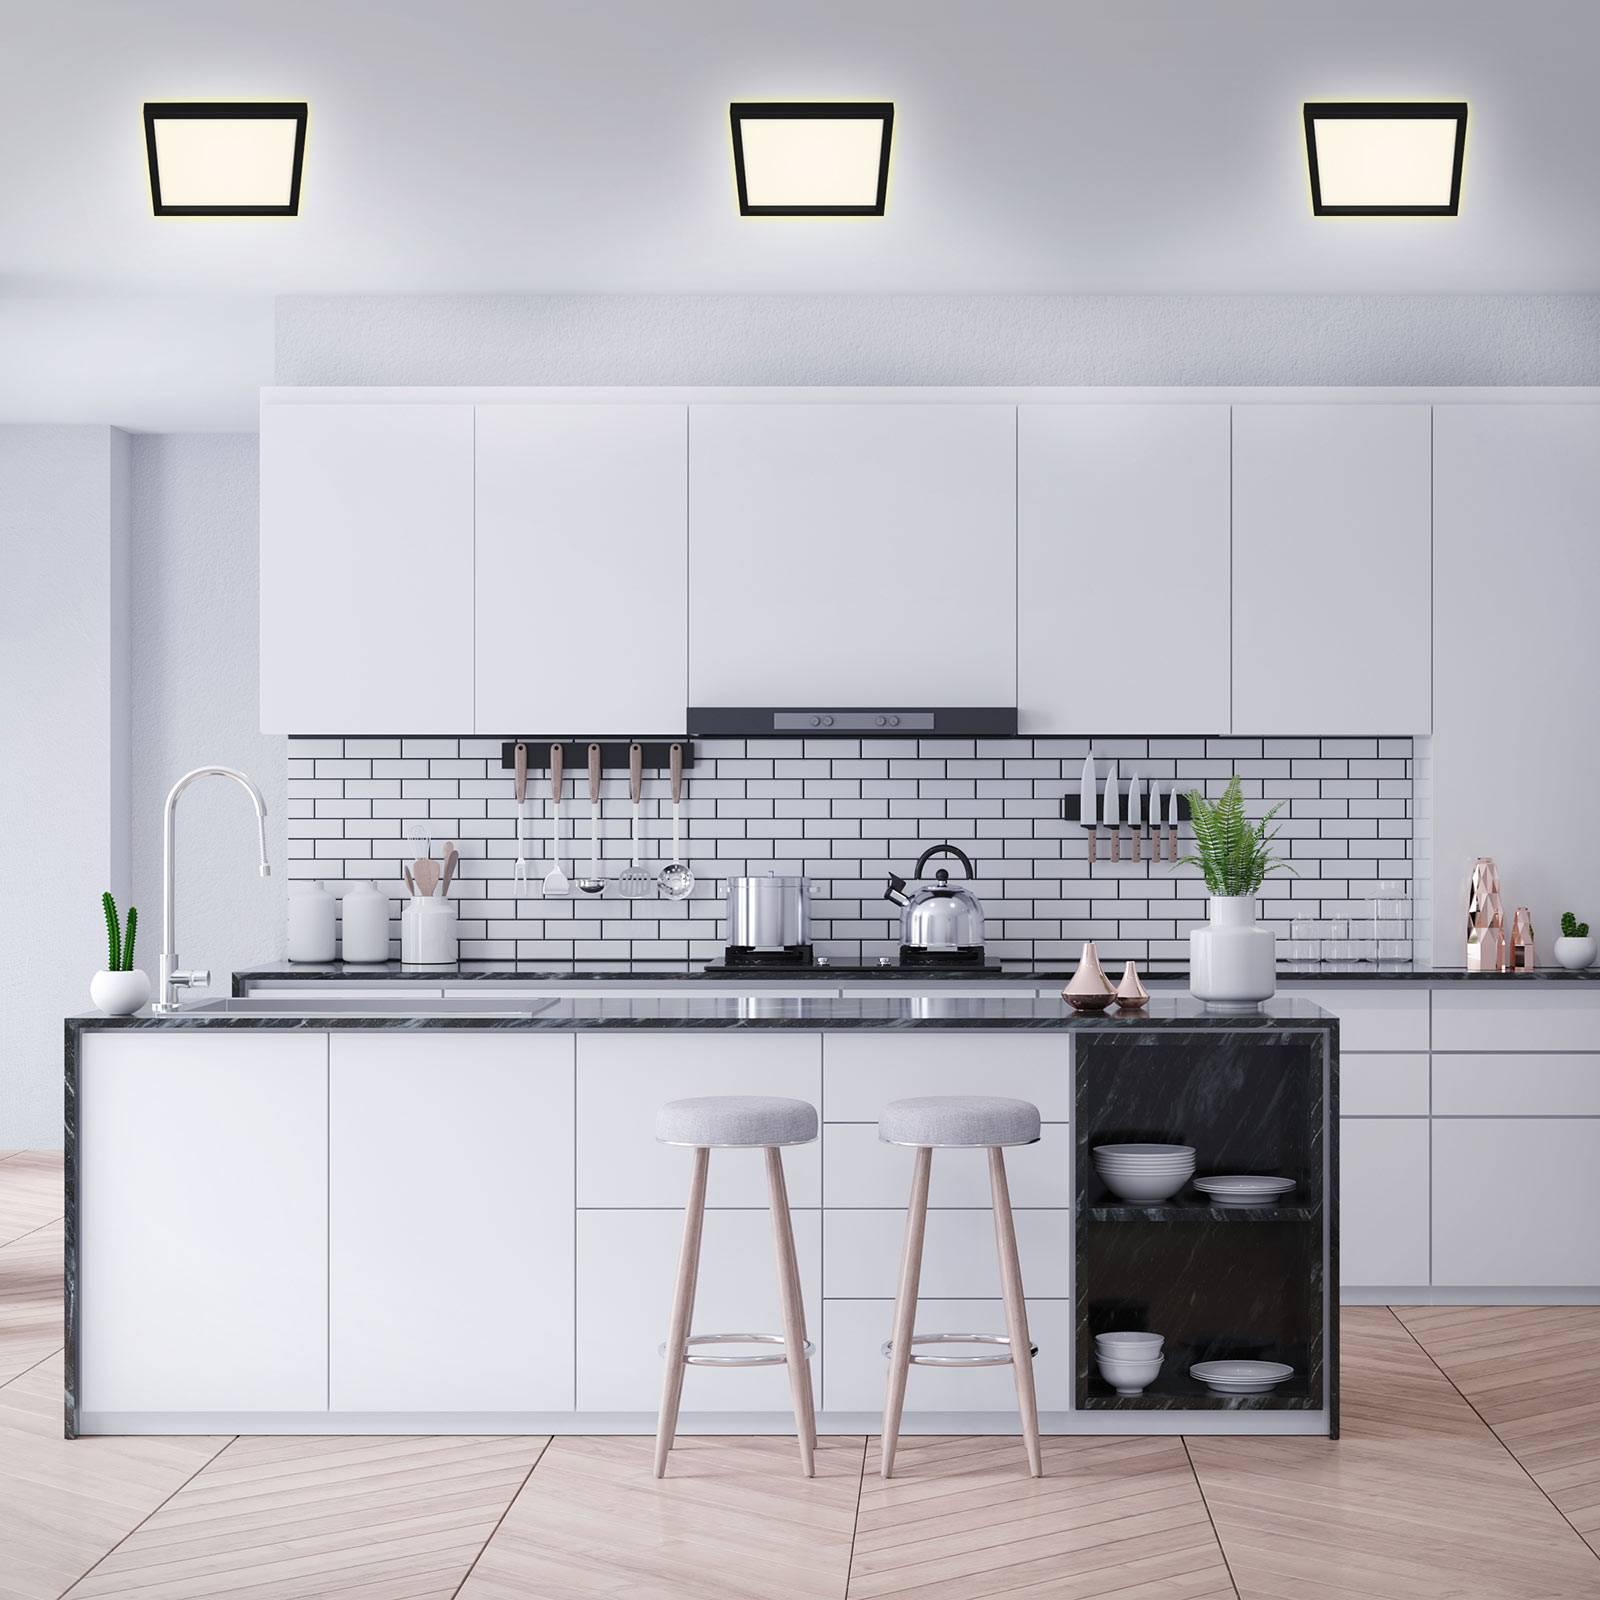 LED plafondlamp 7362, 29 x 29 cm, zwart